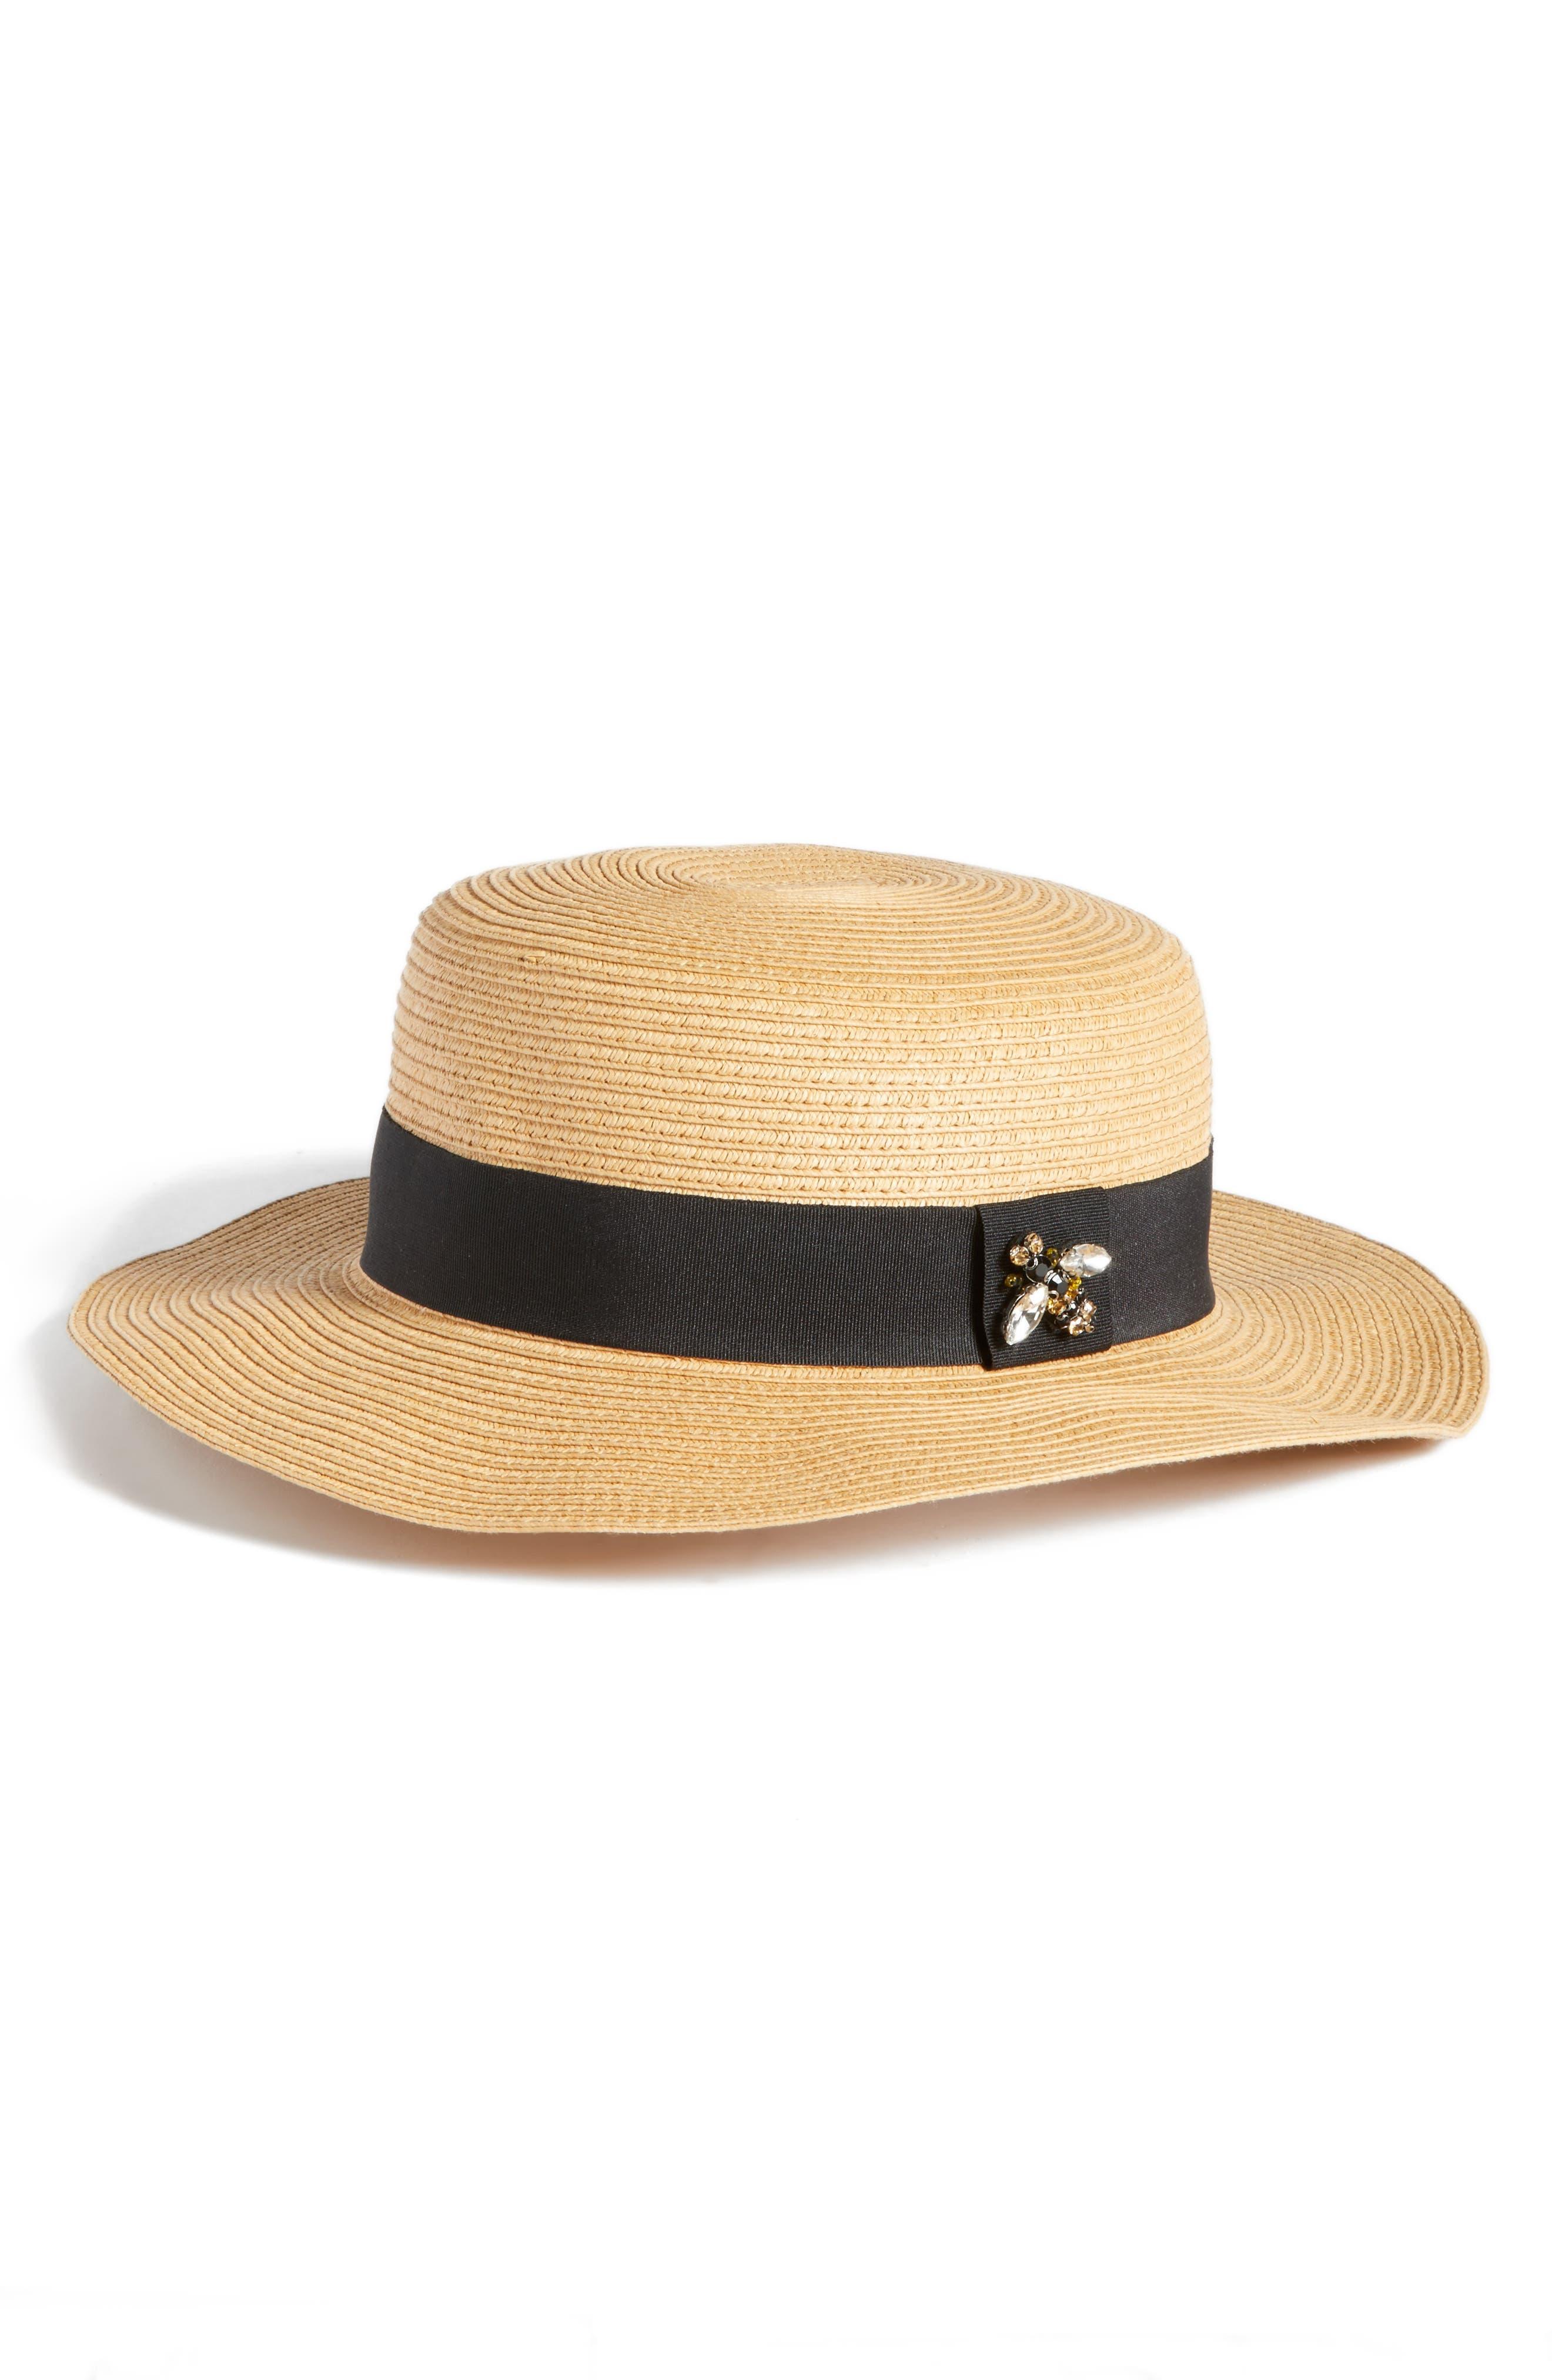 Straw Boater Hat,                         Main,                         color, Tan Dark Natural